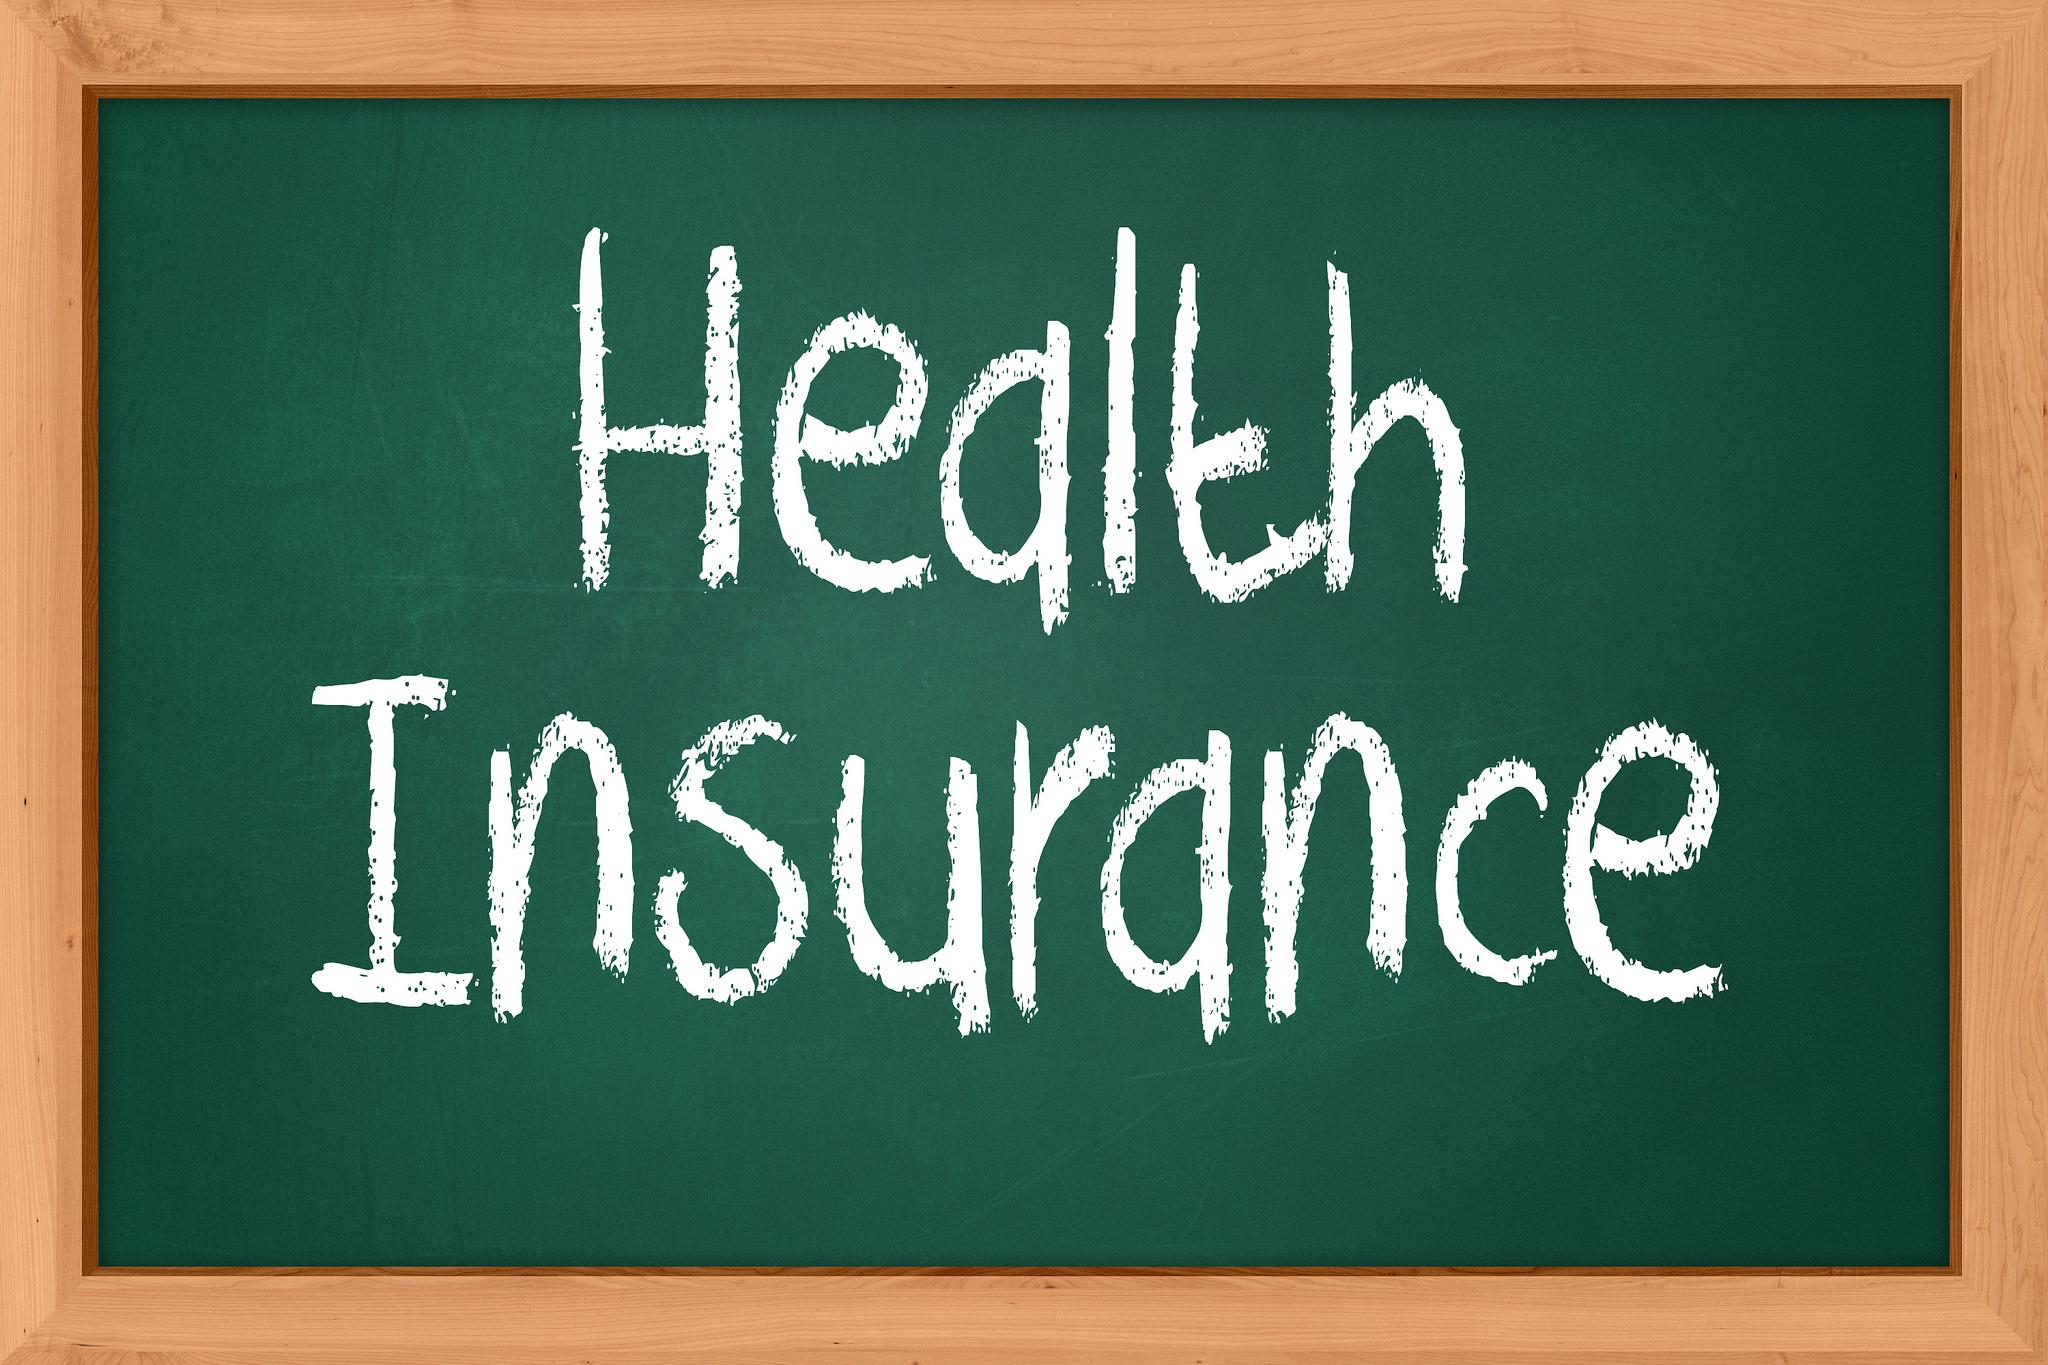 cdphp health insurance photo - 1